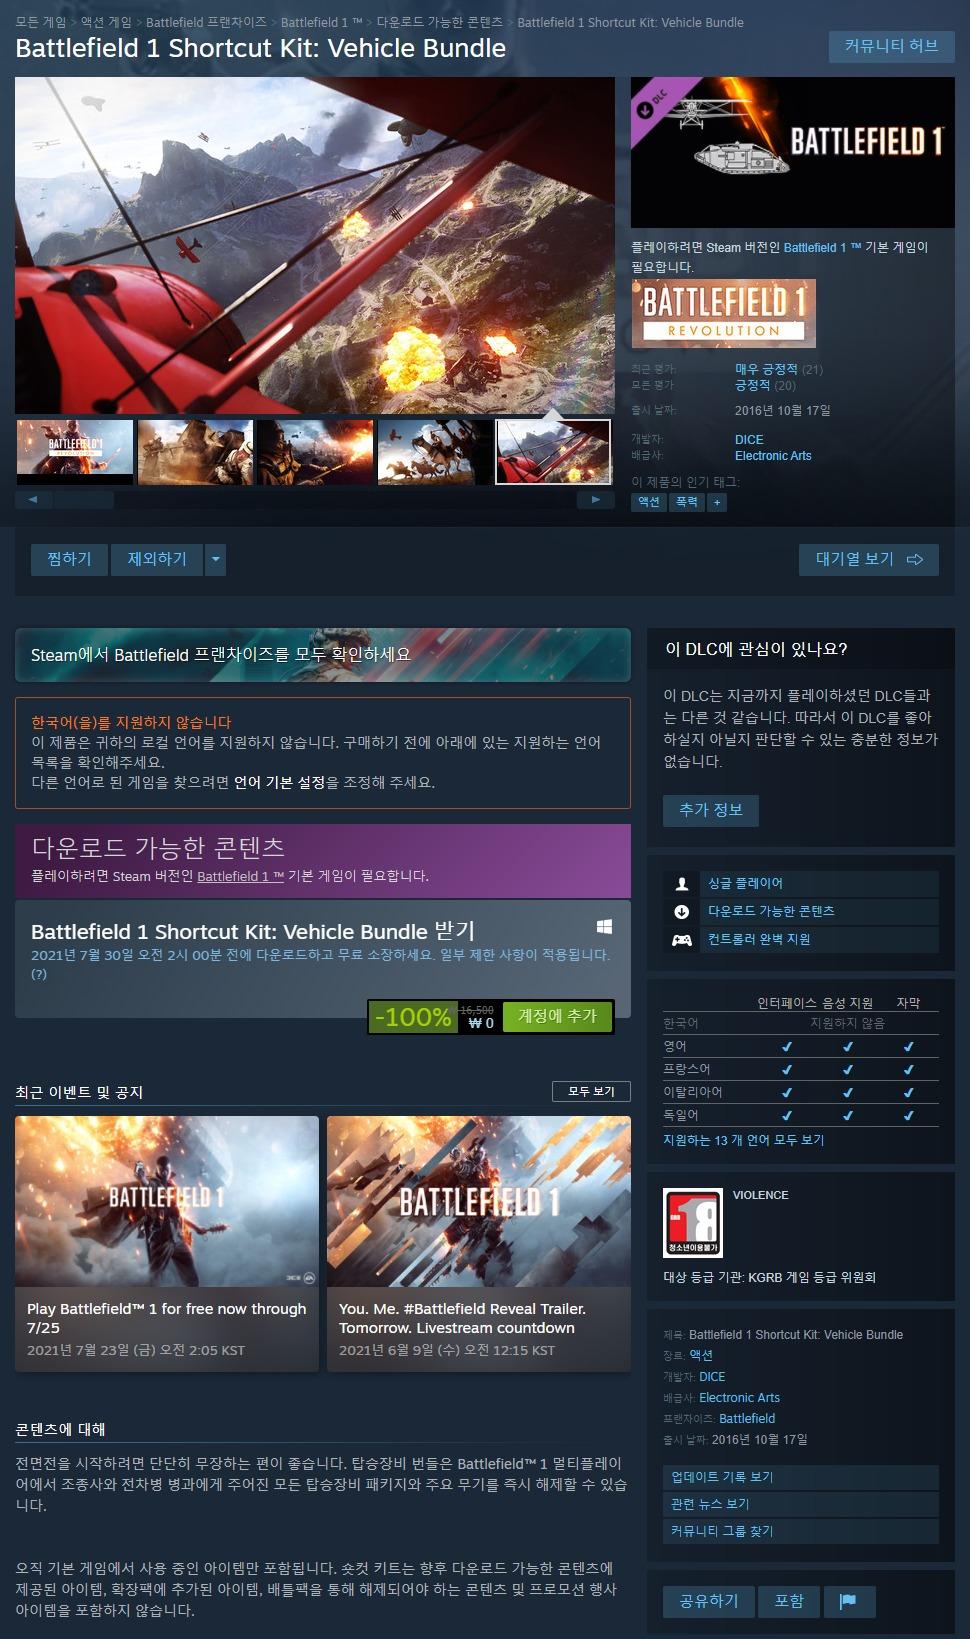 FireShot Capture 012 - Battlefield 1 Shortcut Kit_ Vehicle Bundle 상품을 Steam에서 구매하고 100% 절약하세_ - store.steampowered.com.jpg